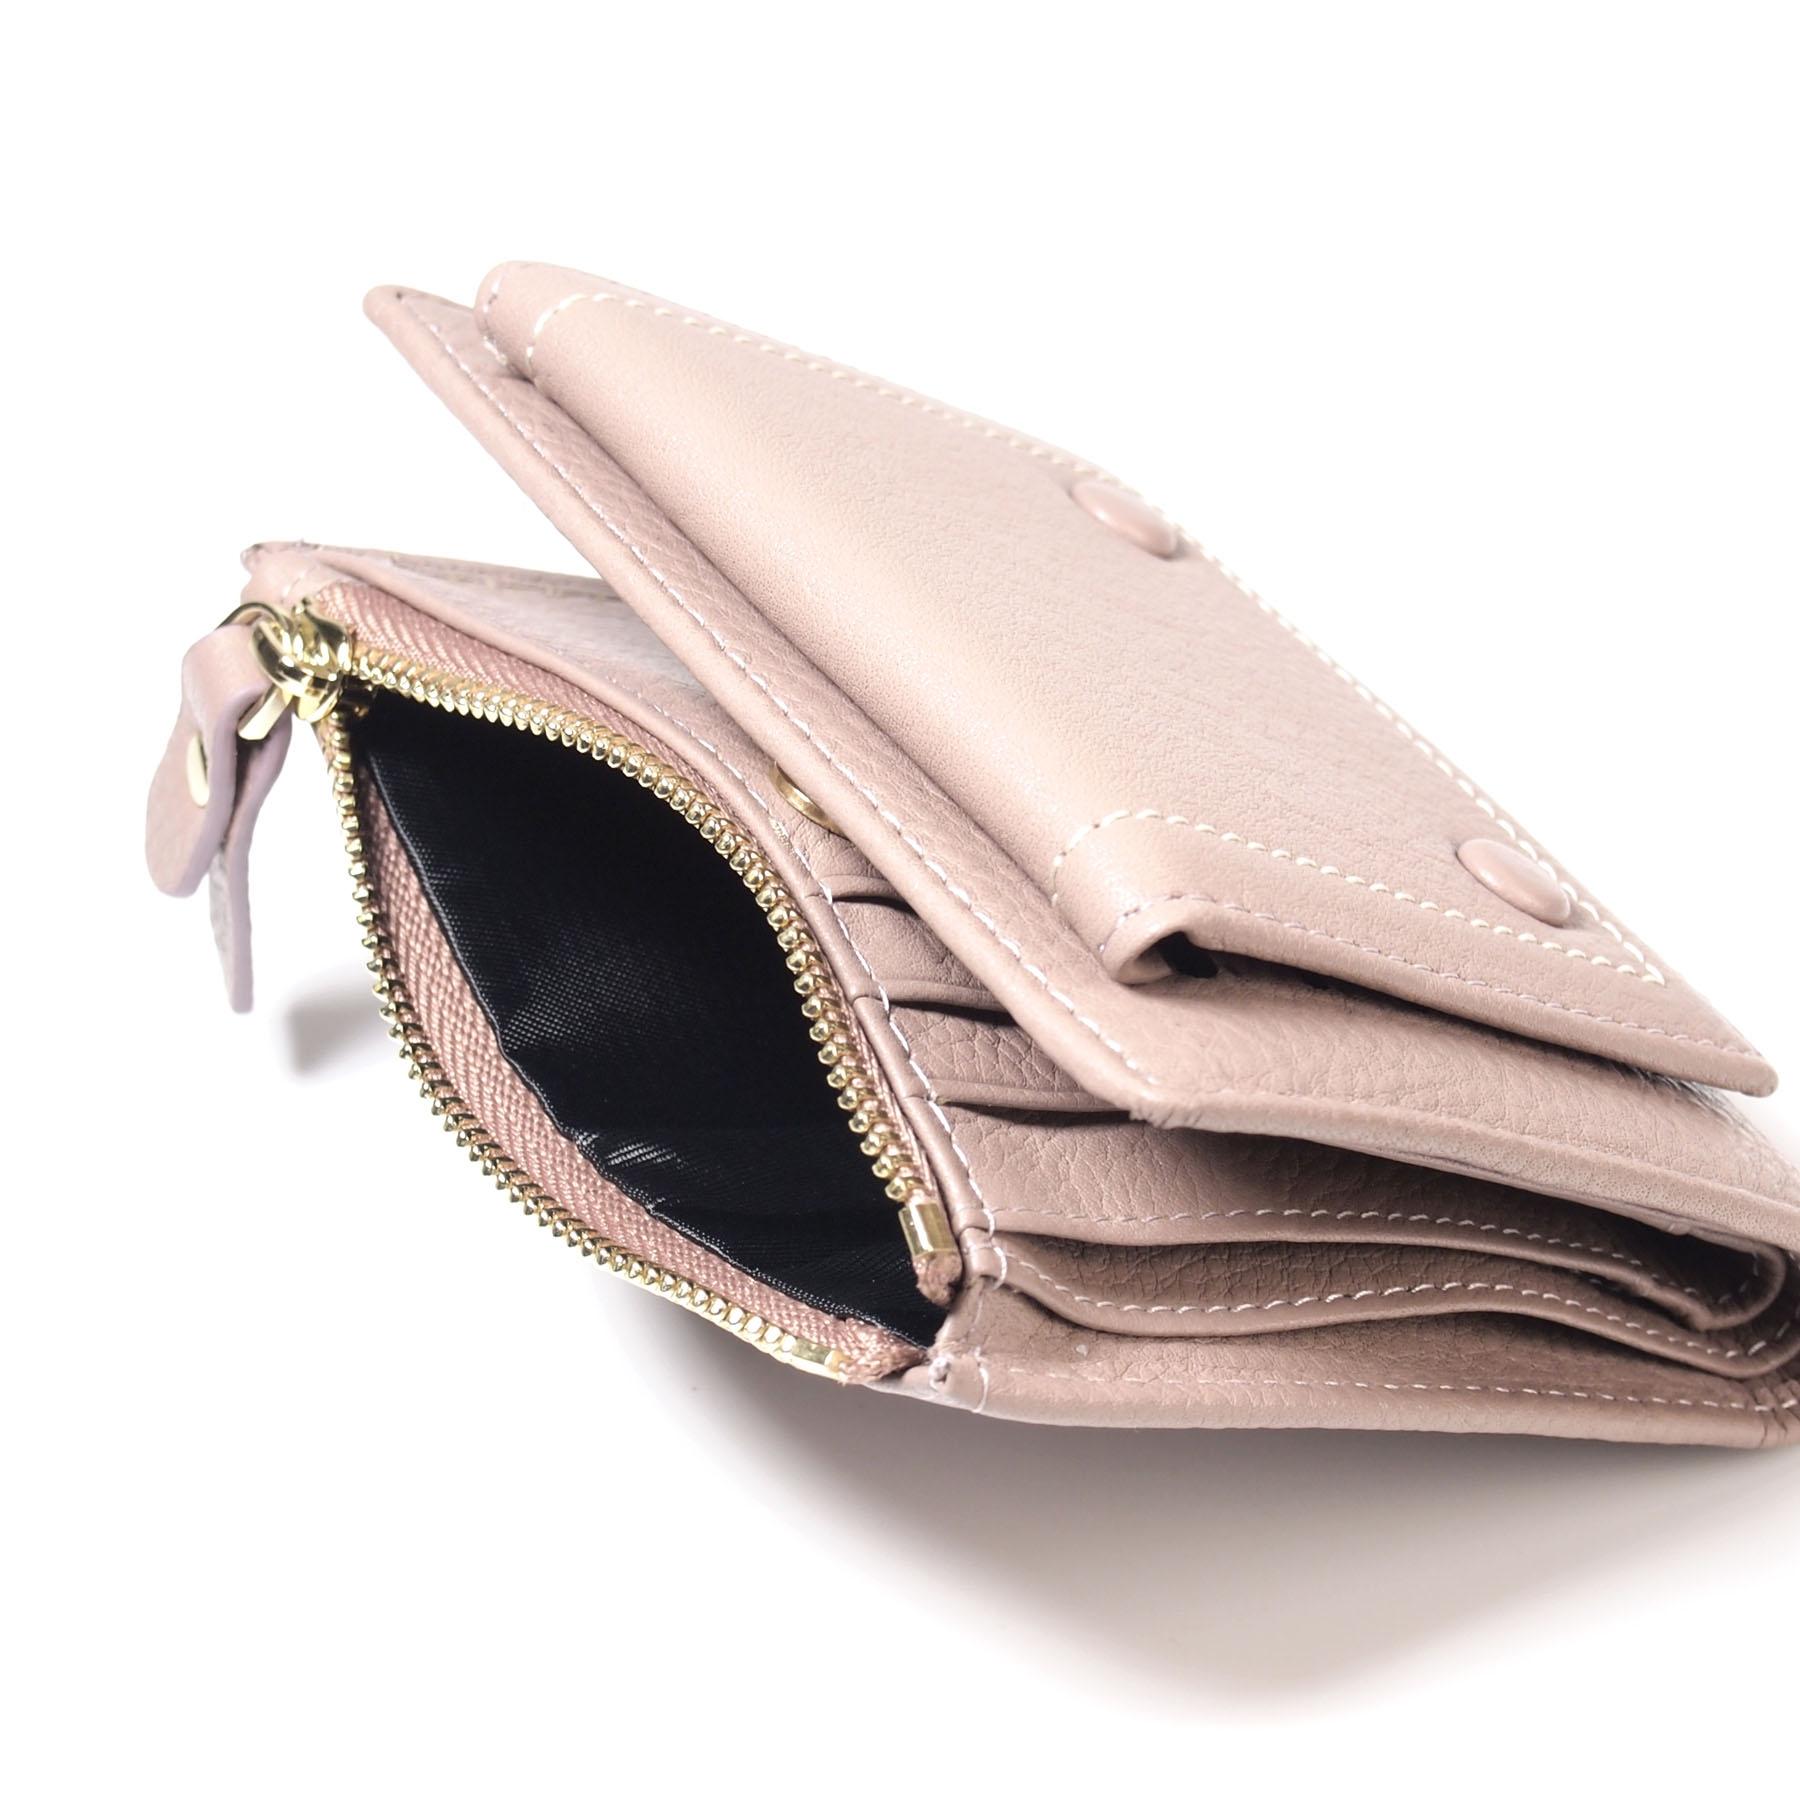 Butterfield Rumi Wallet Snap-top View